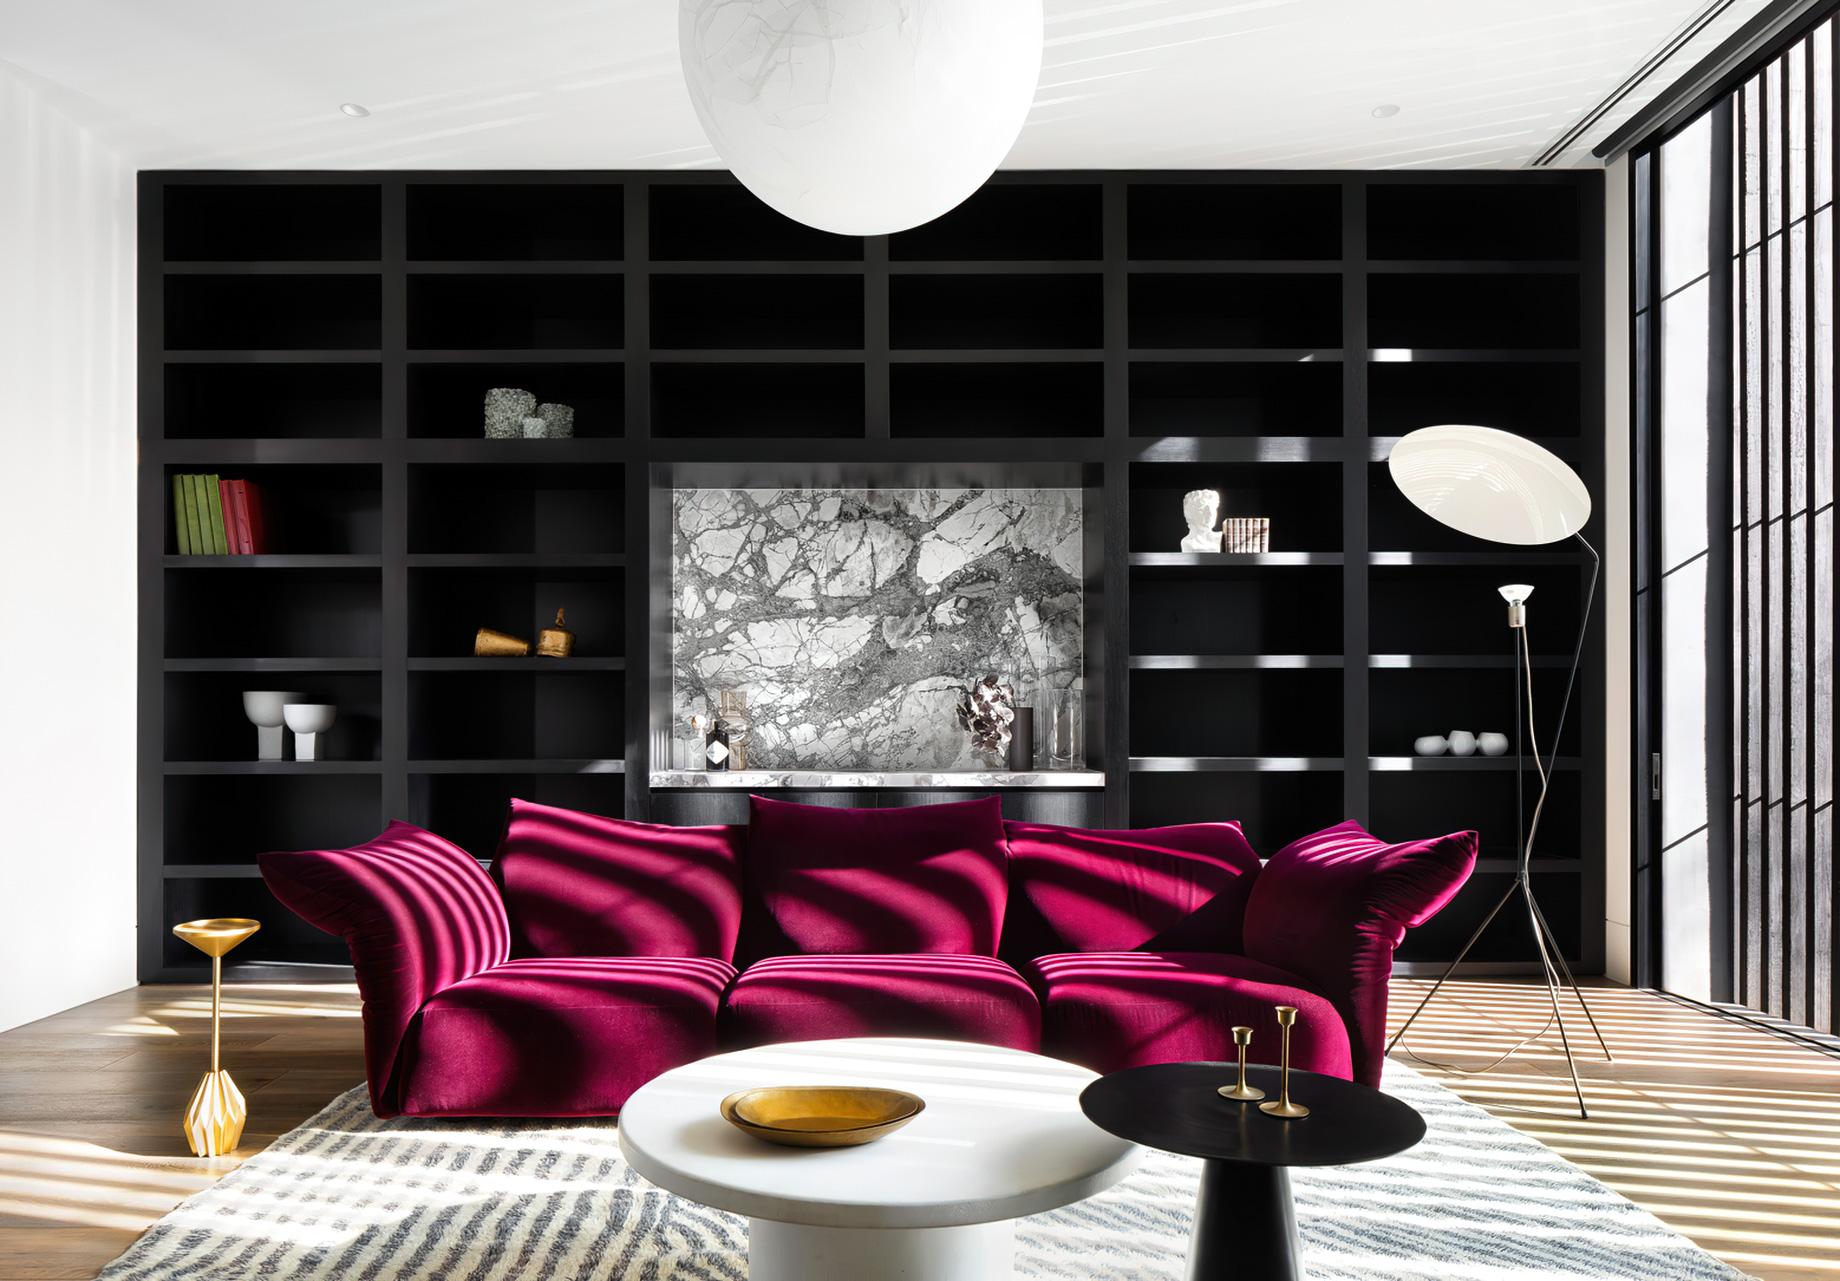 Rosedale Modern Contemporary House – Melbourne, Victoria, Australia